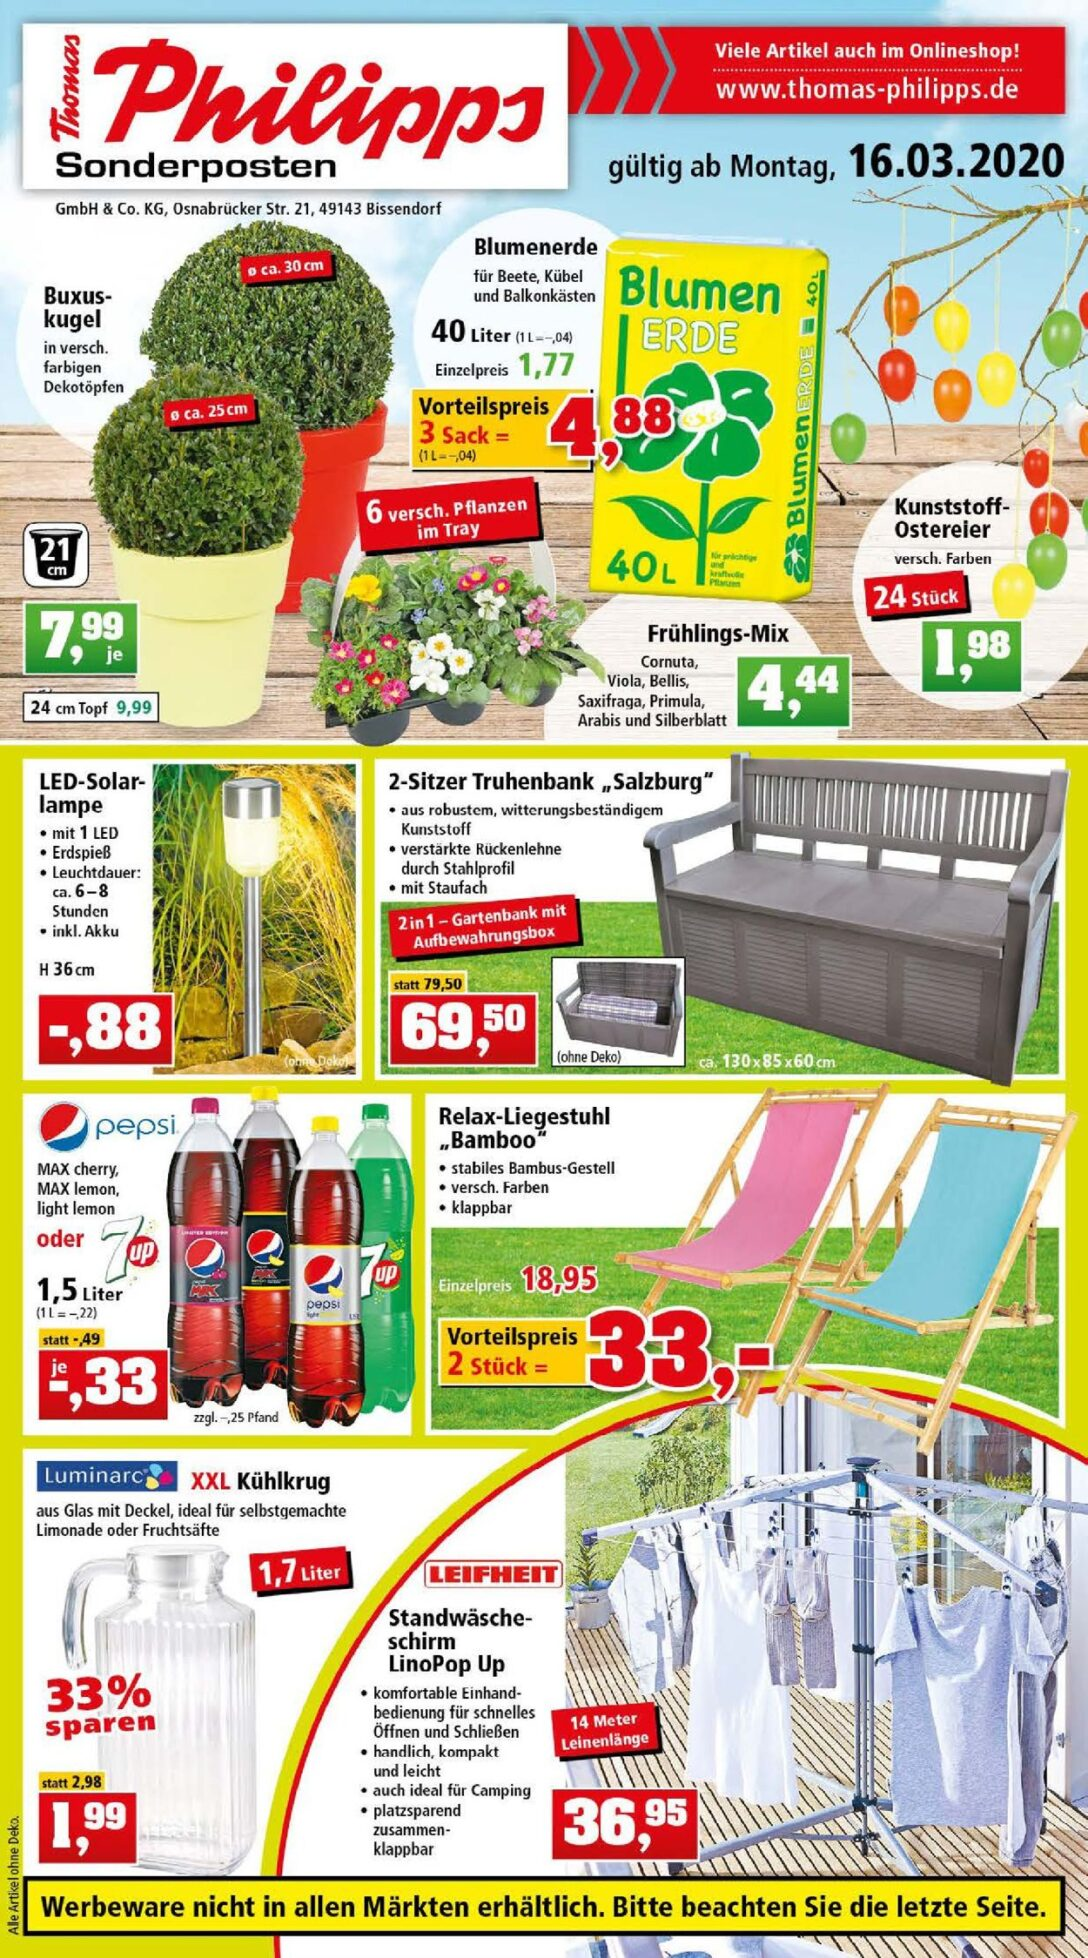 Large Size of Aldi Gartenbank Klappbar 2019 Kinder Aluminium Alu 2018 2020 Thomas Philipps Prospekt 1603 21032020 Rabato Relaxsessel Garten Wohnzimmer Aldi Gartenbank